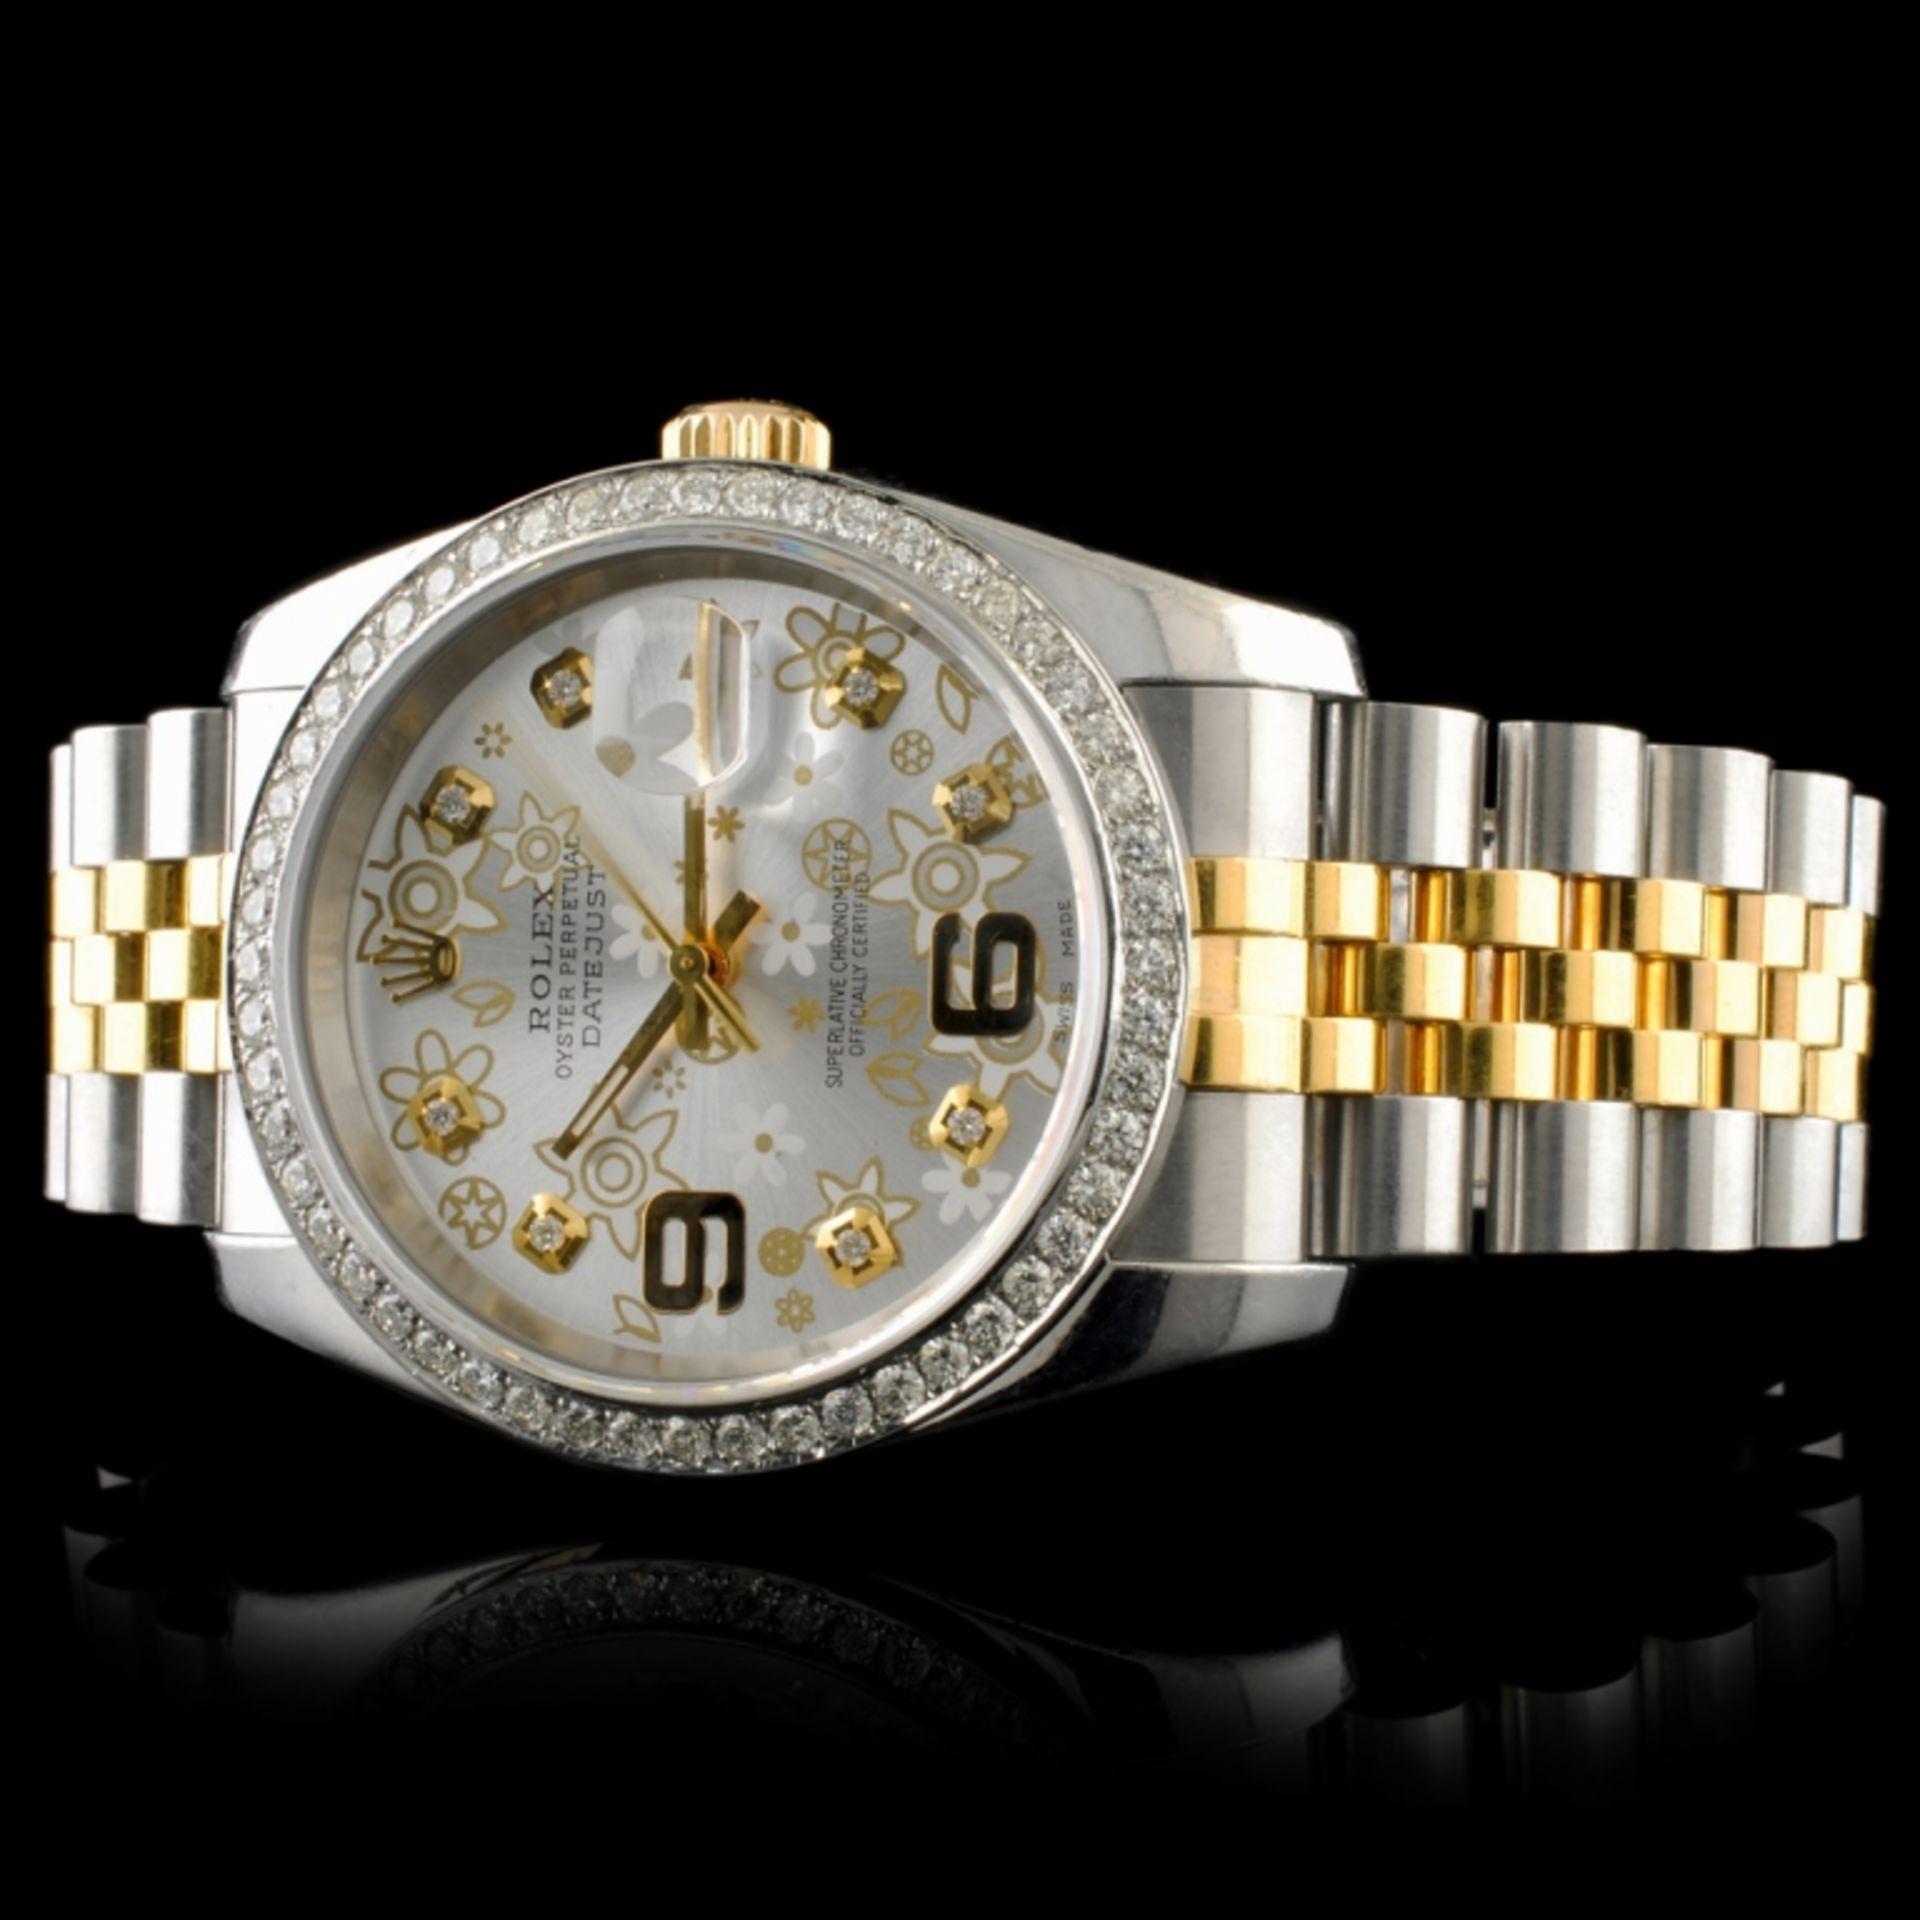 Rolex DateJust 116233 18K YG/SS Diamond 36MM Watch - Image 2 of 7